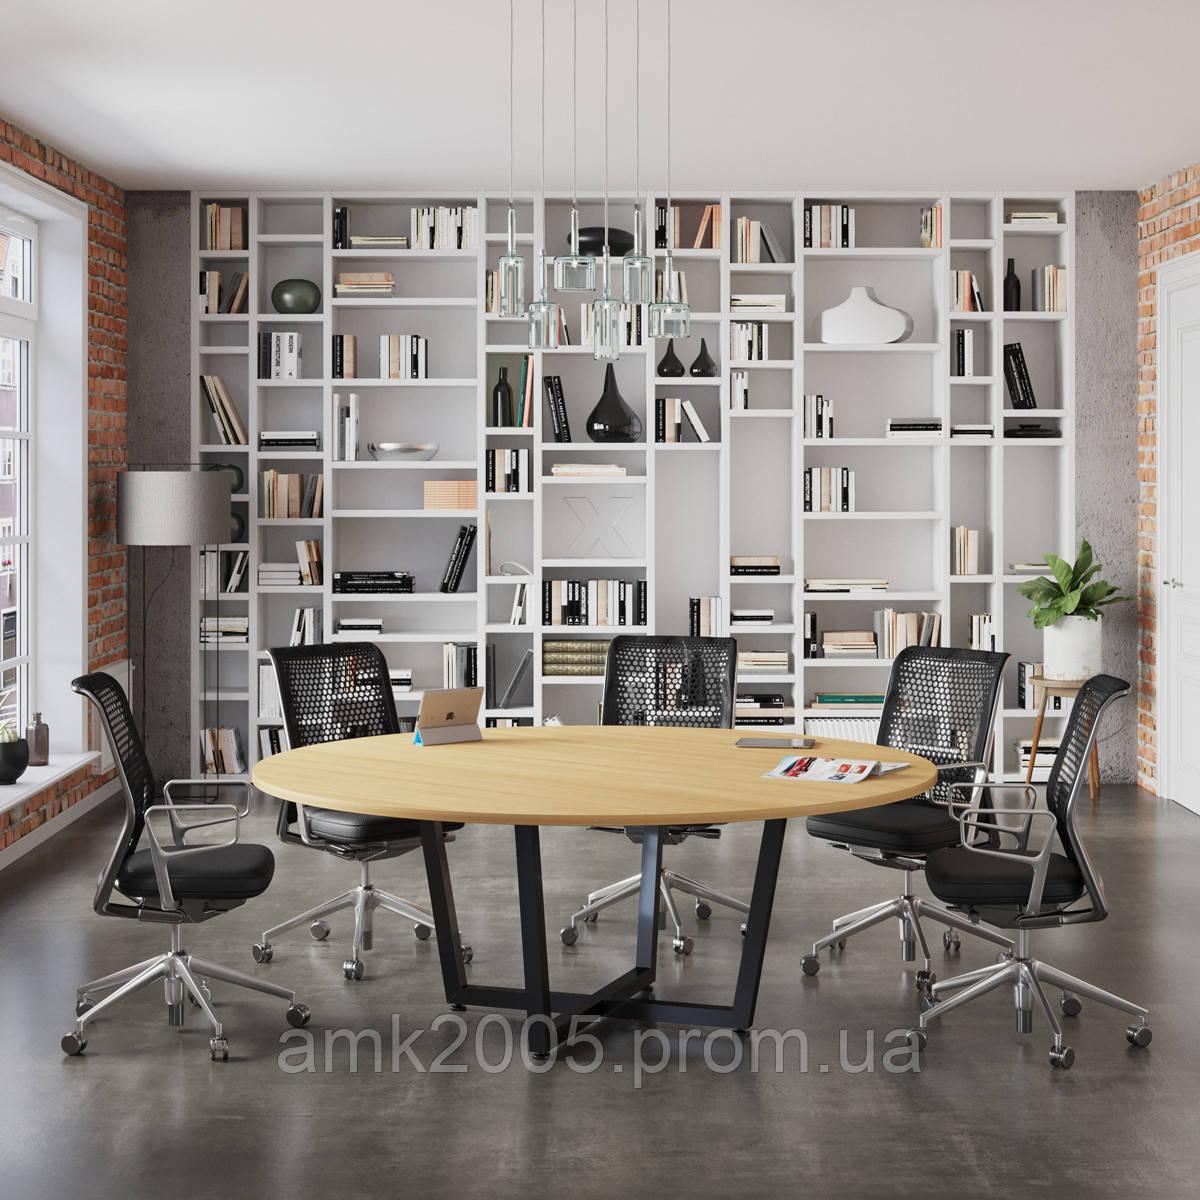 Стол для переговоров D-2000 Loft design Дуб Борас